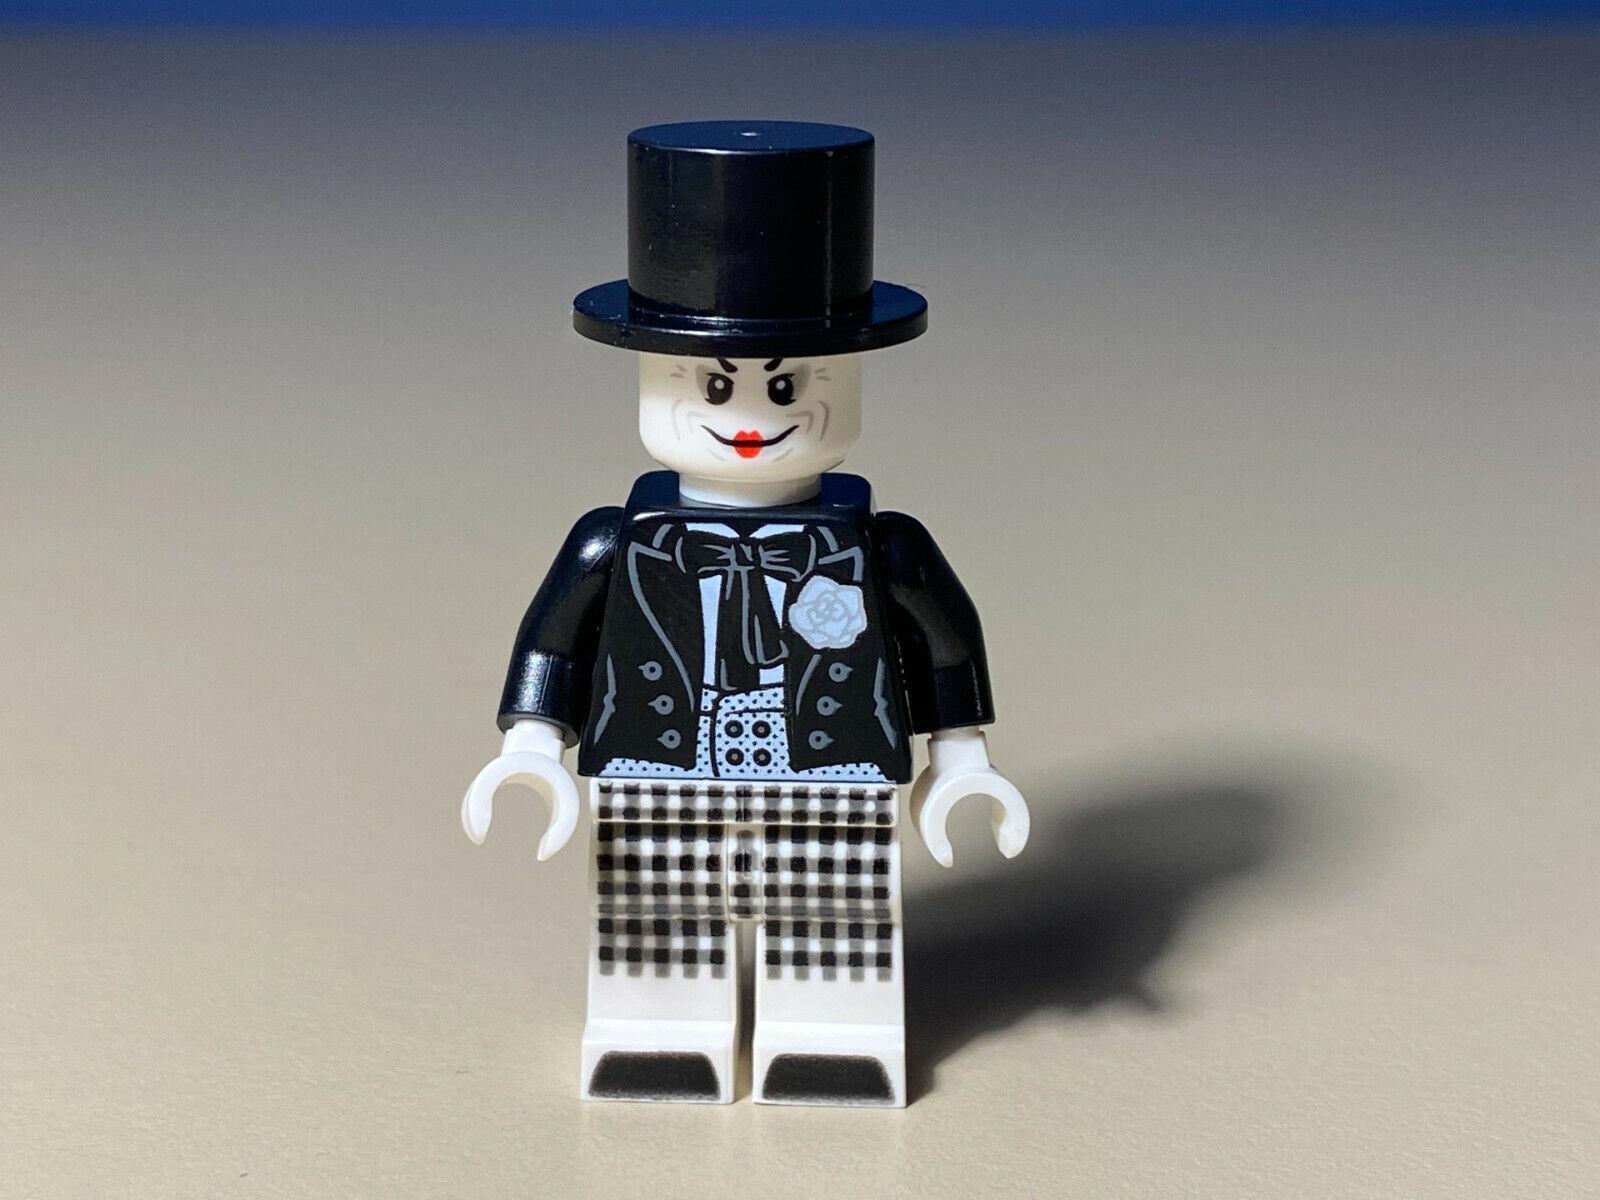 Lego Eclipso 41239 DC Super Hero Girls Minifigure